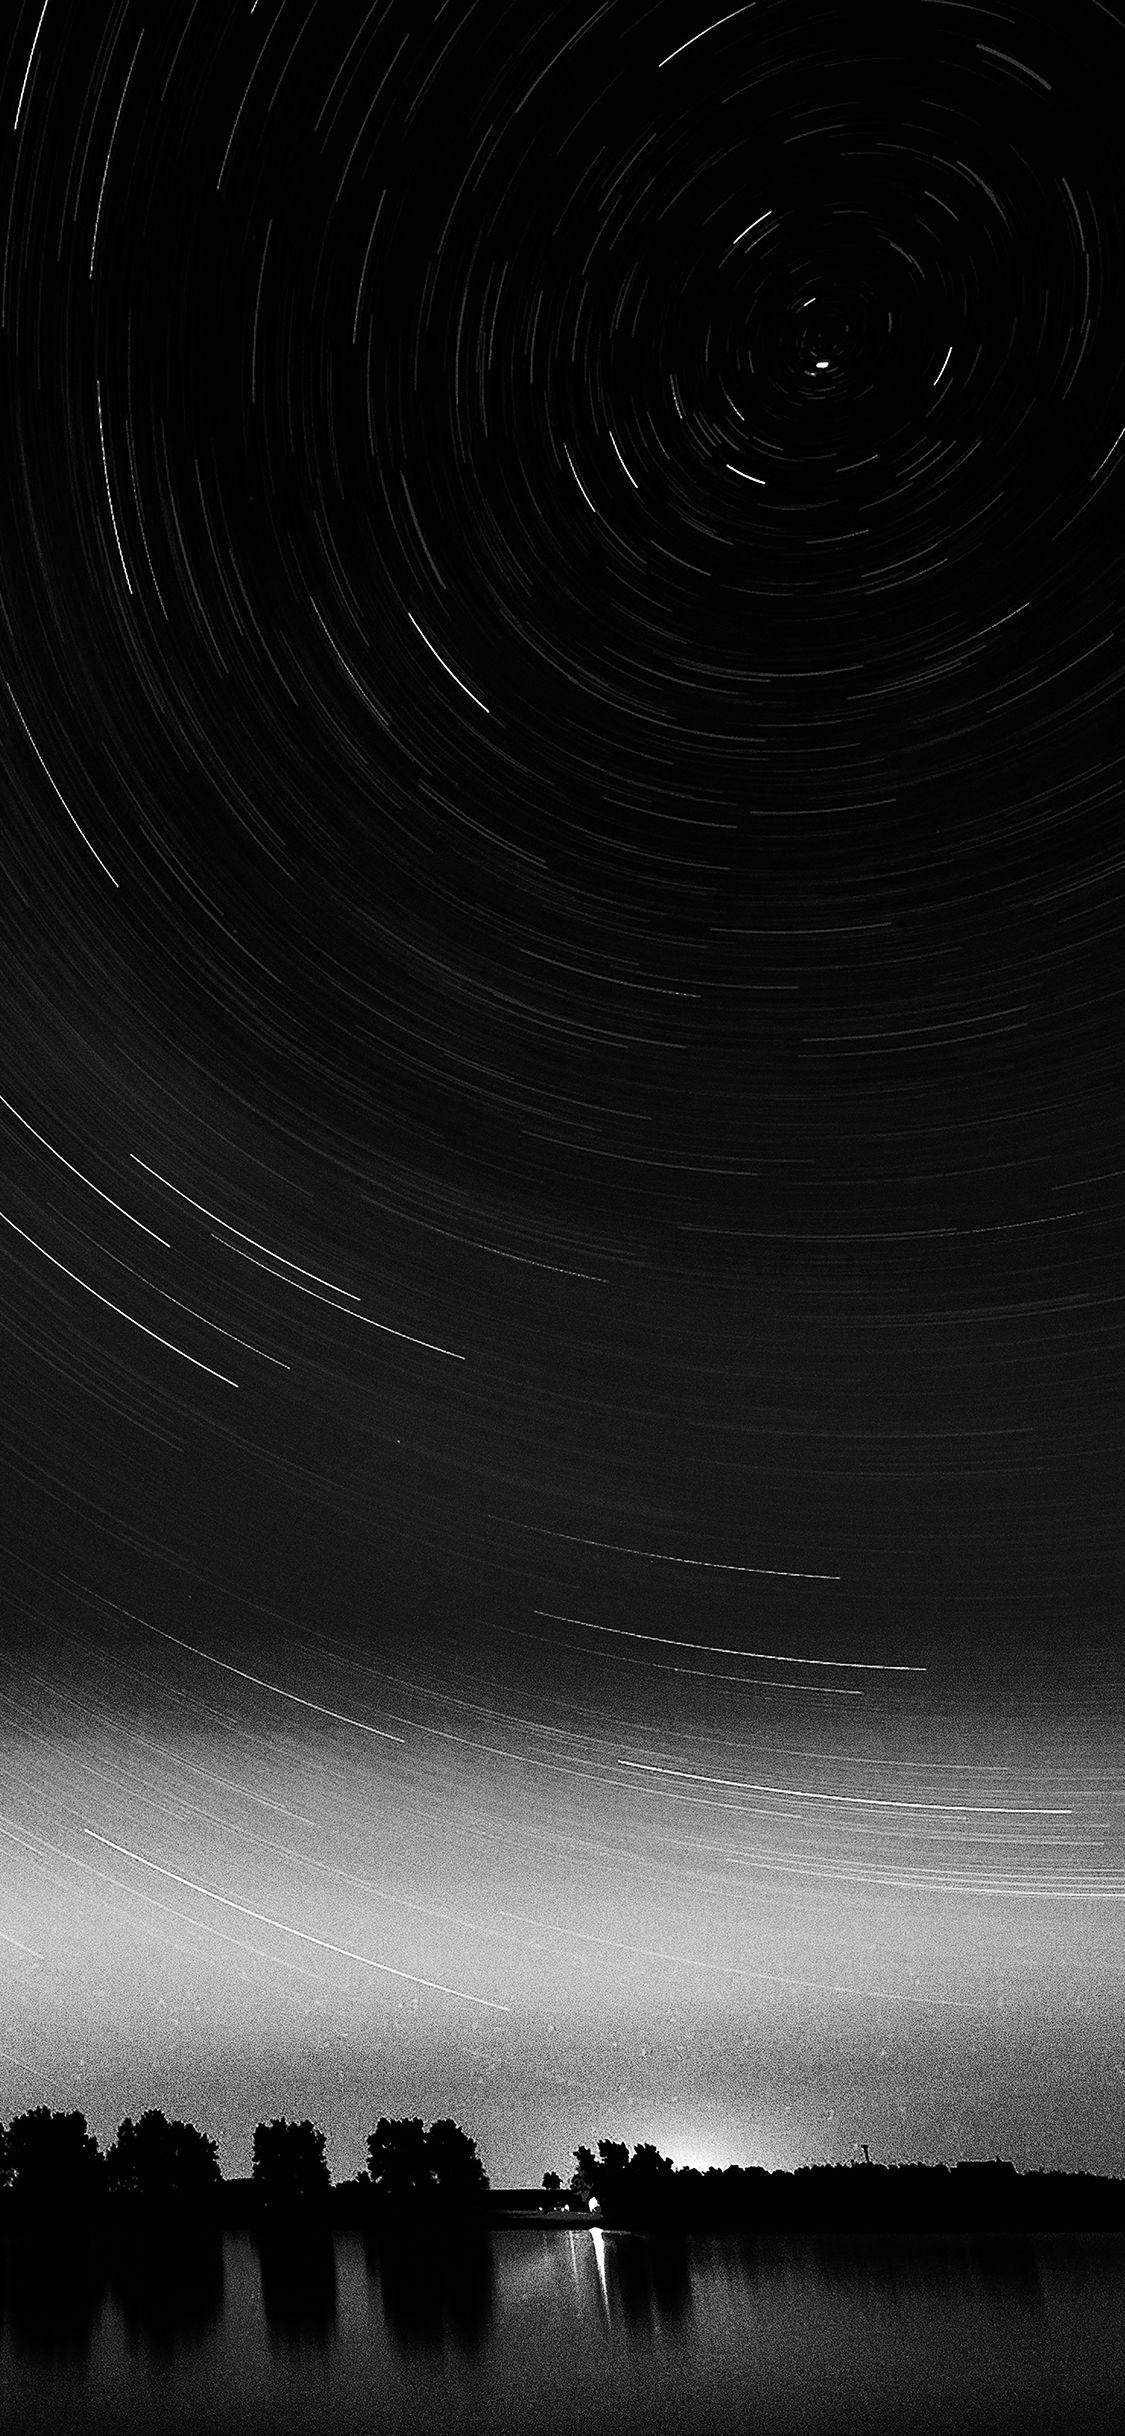 Iphonexpapers Com Apple Iphone Wallpaper Me31 Star Gazing Night Bw